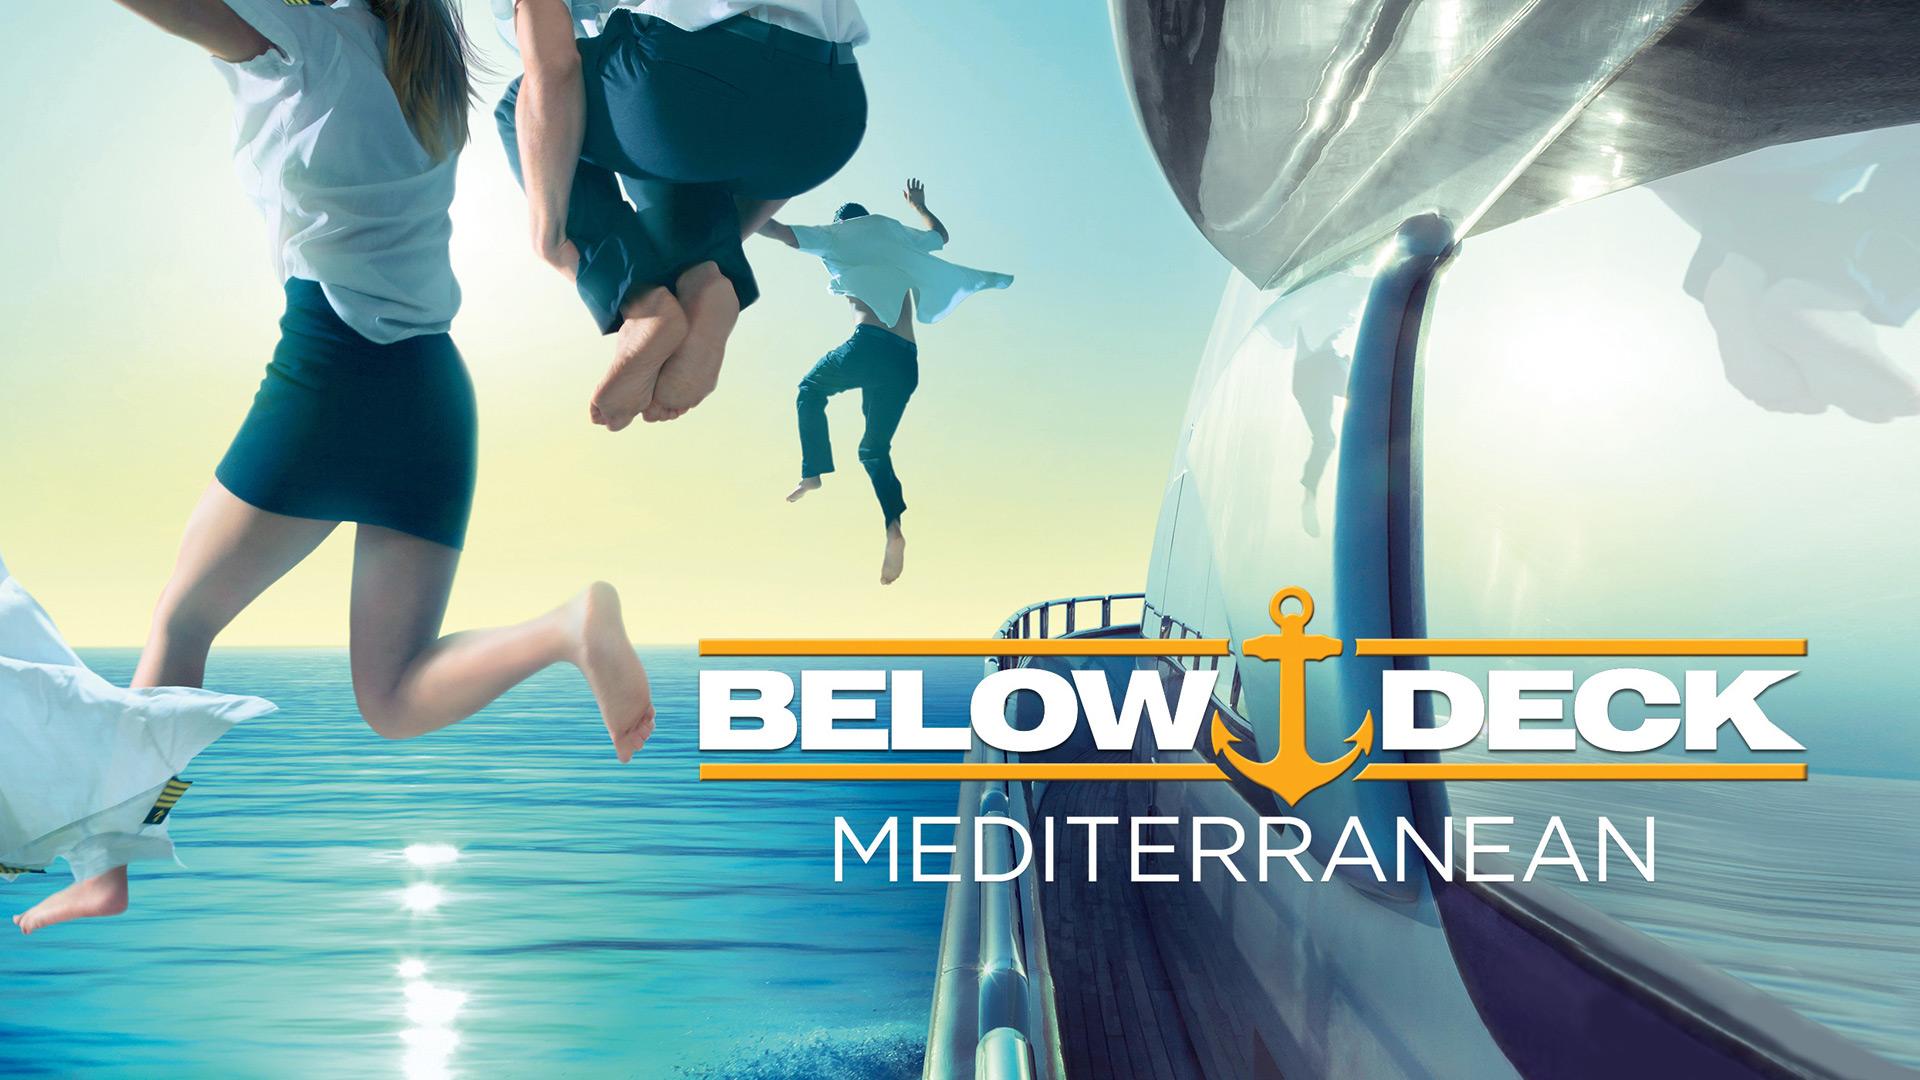 Below Deck Mediterranean, Season 1